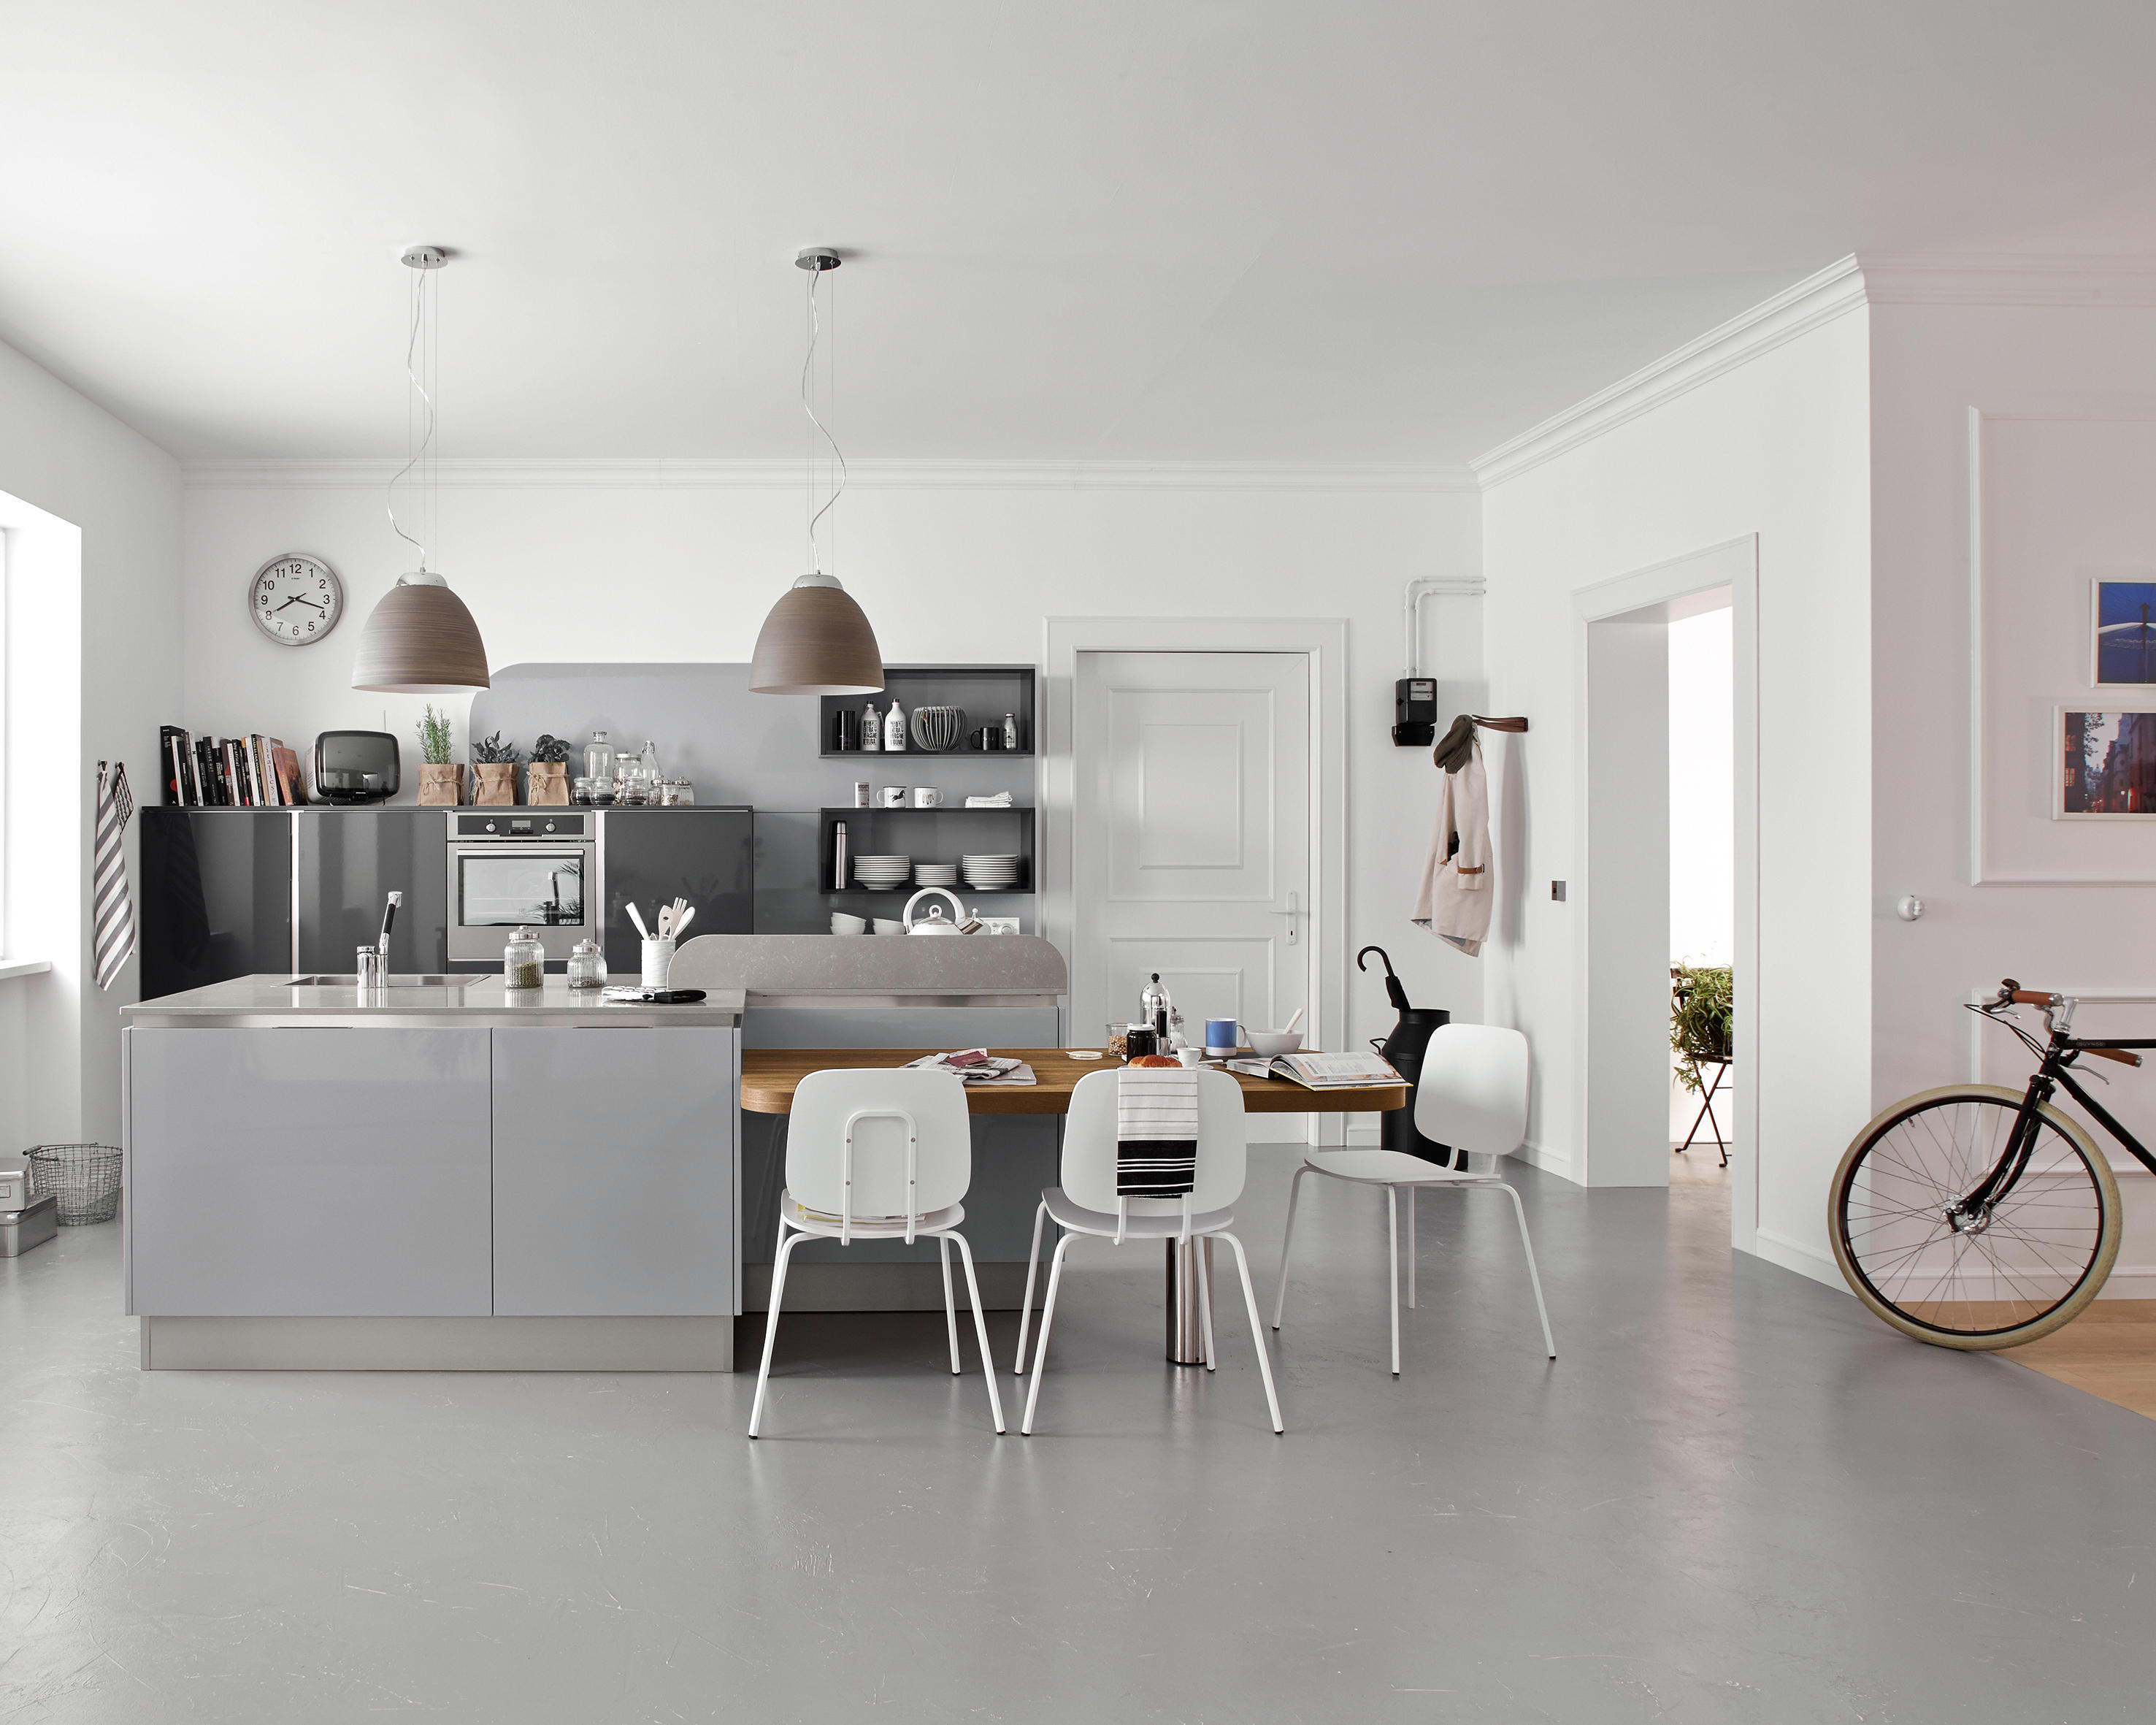 Veneta Cucine Carrera.Carrera Go Fitted Kitchens From Veneta Cucine Architonic